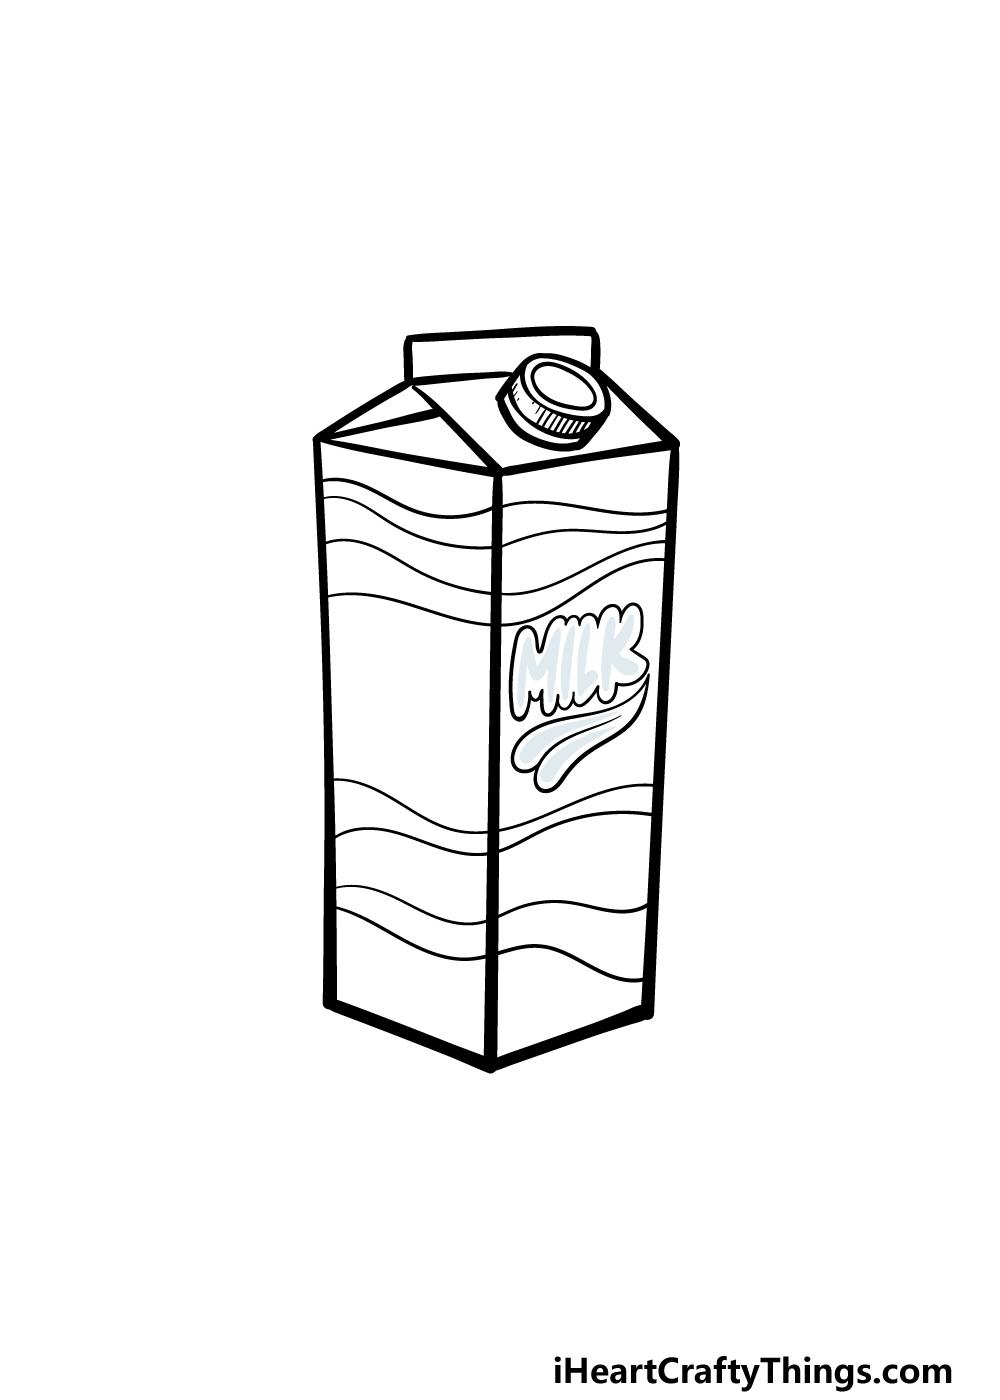 drawing a milk carton step 5